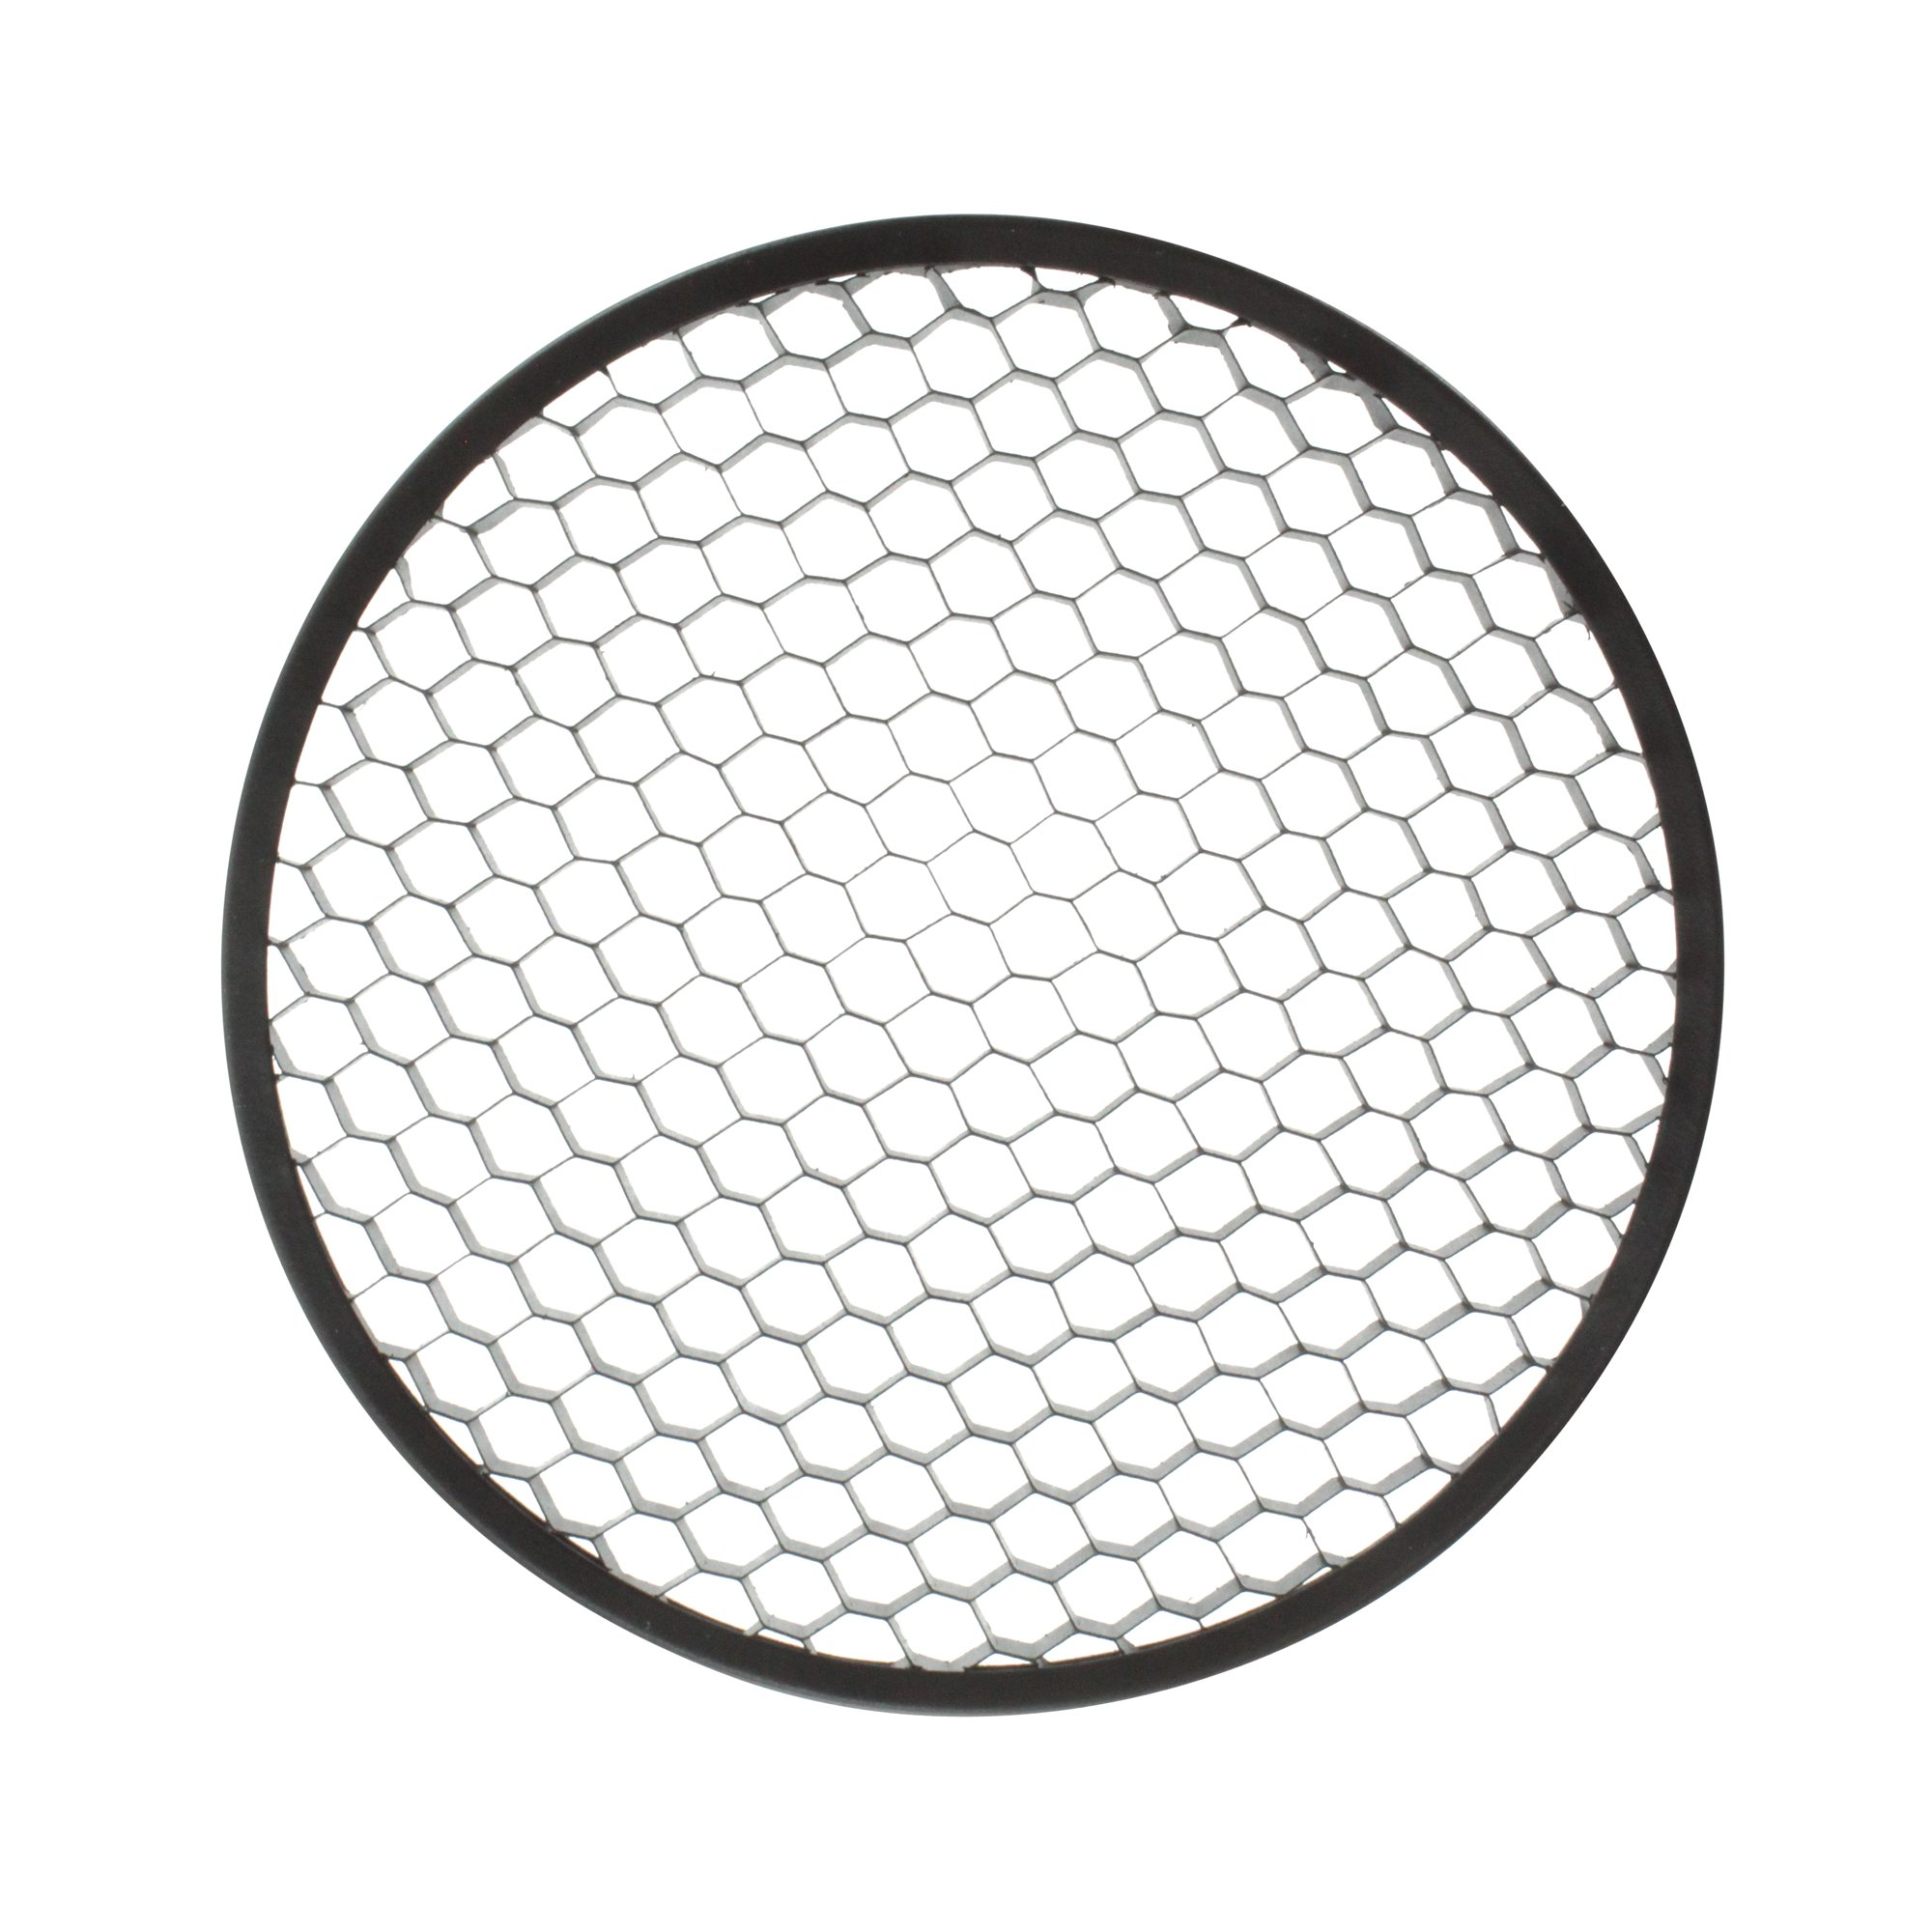 Lightolier 8579 Lytespan Track Lighting Par-Tech Hex Cell Louver Accessory, Black